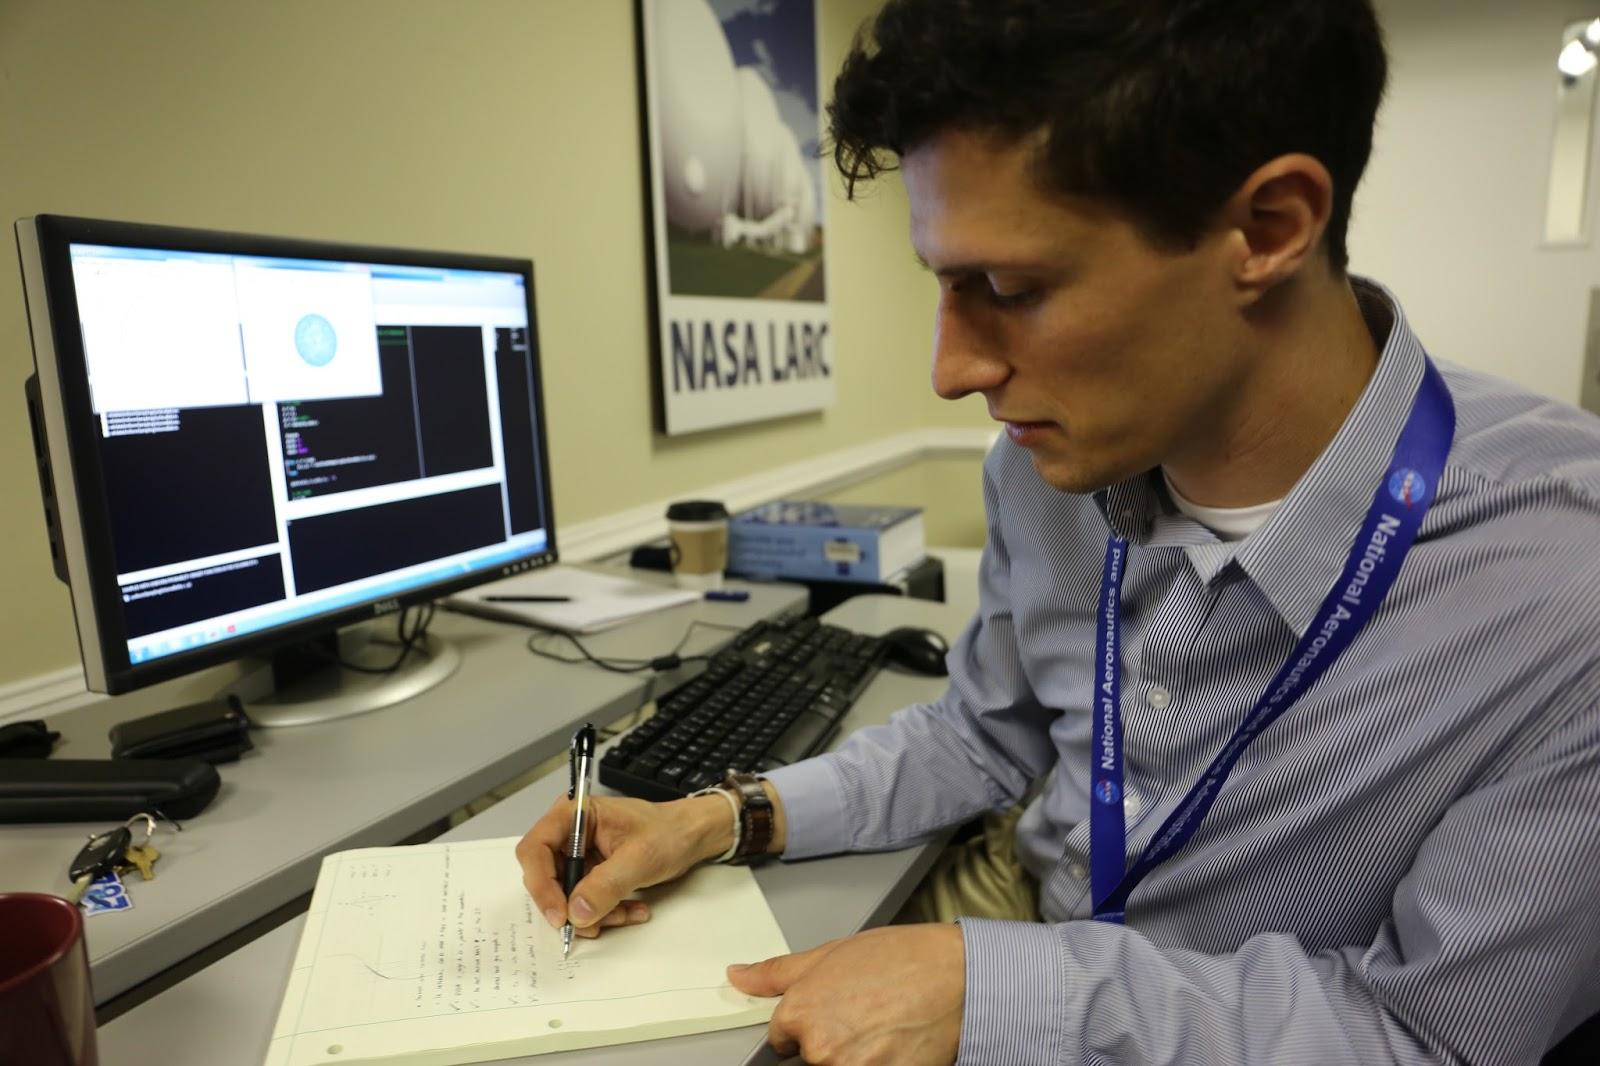 Congratulations! Javier Puig-Navarro got the Aerospace Engineering Alumni Advisory Board Fellowship